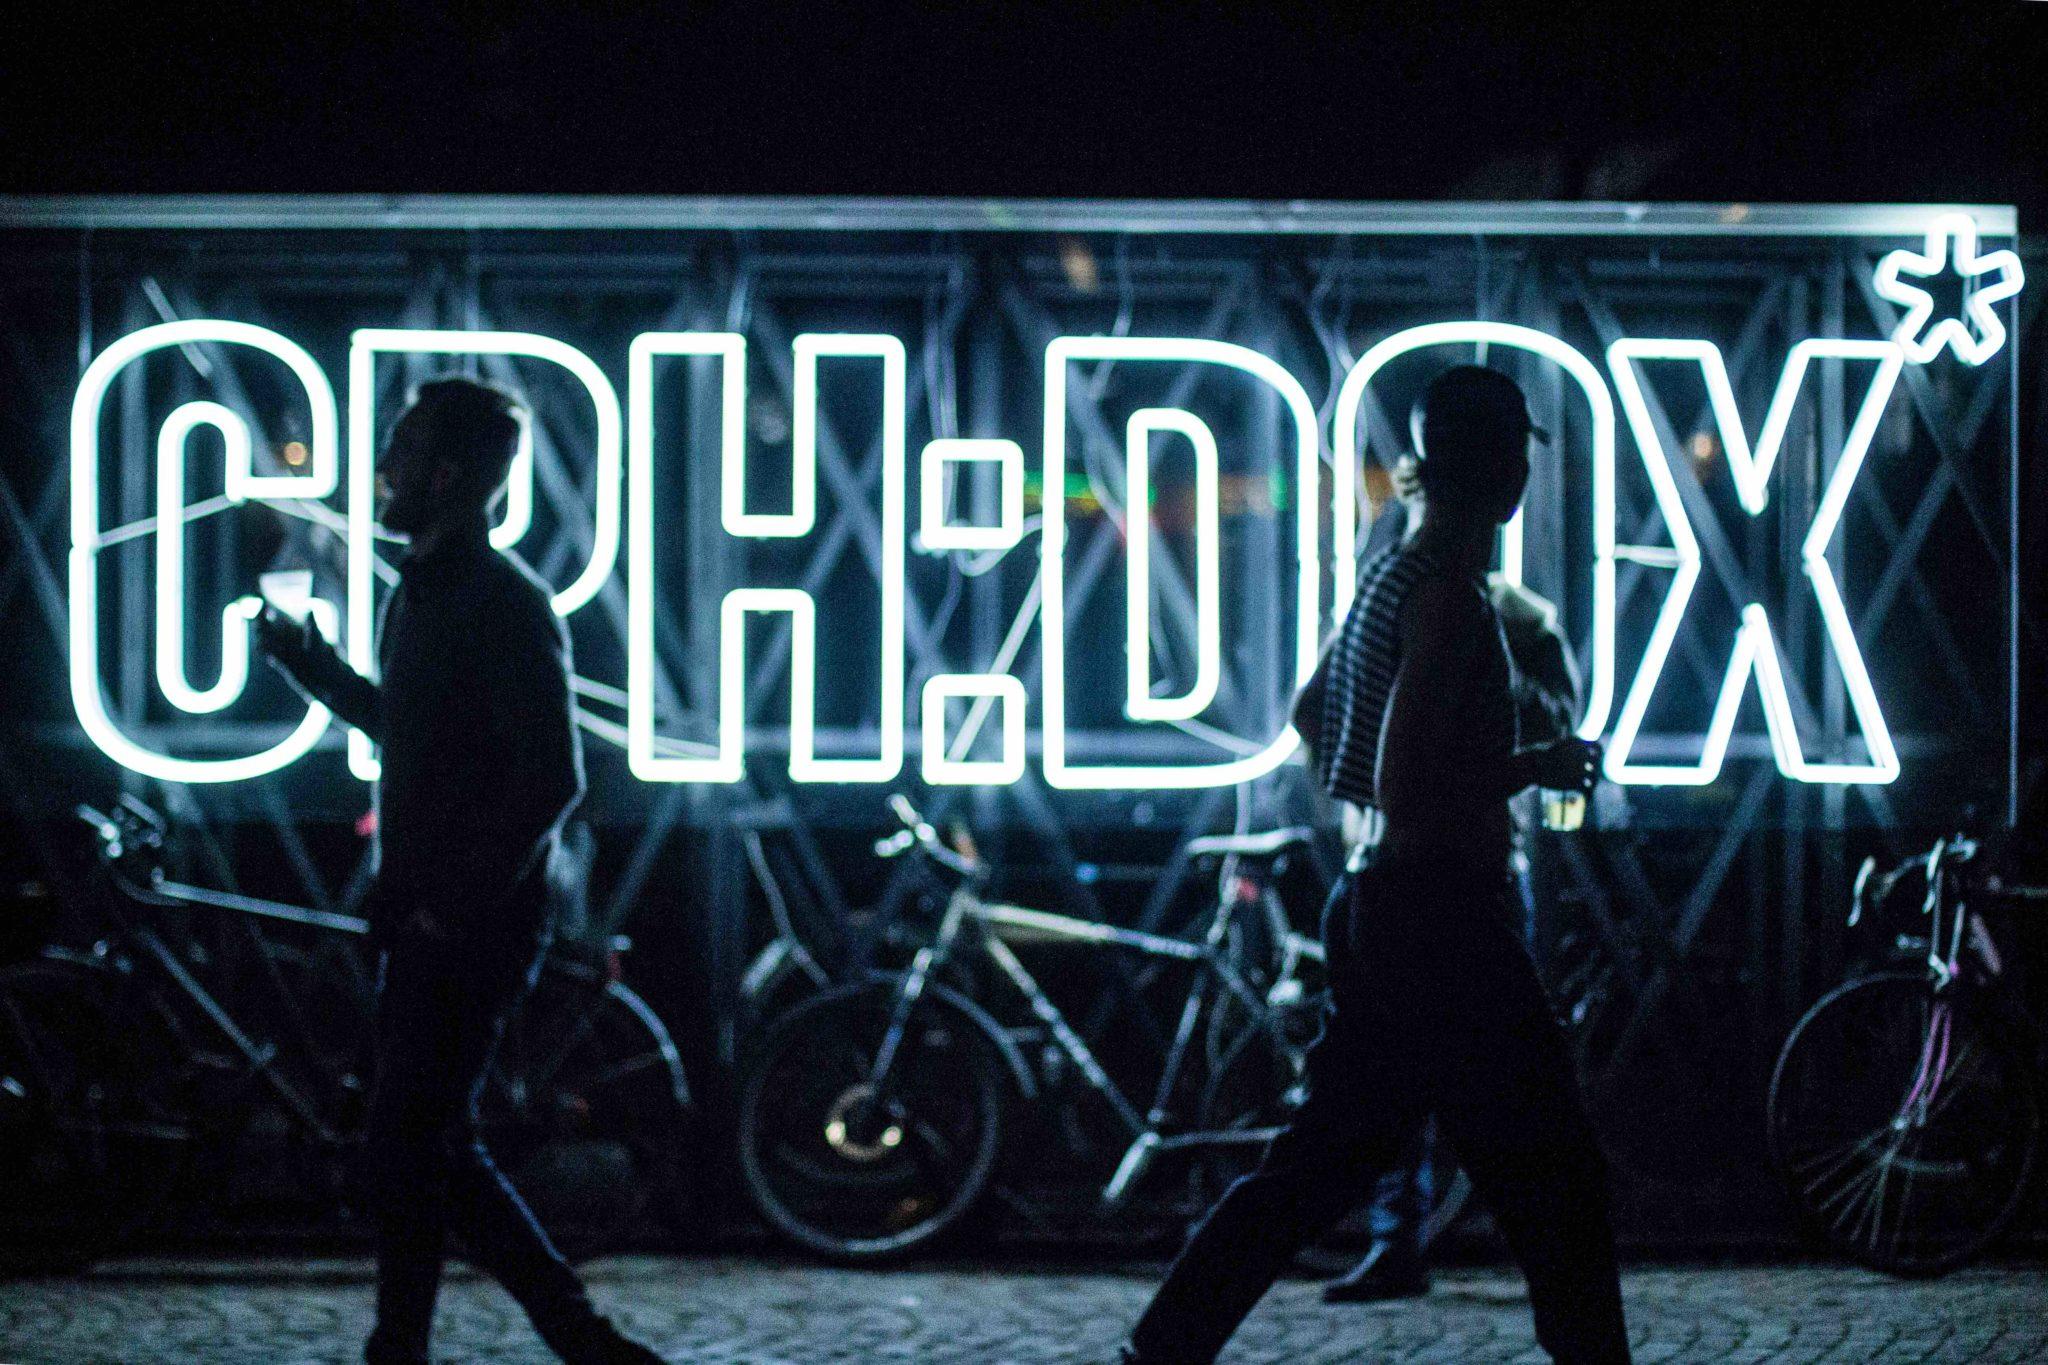 CPH:DOX to launch Big Digital Live Platform